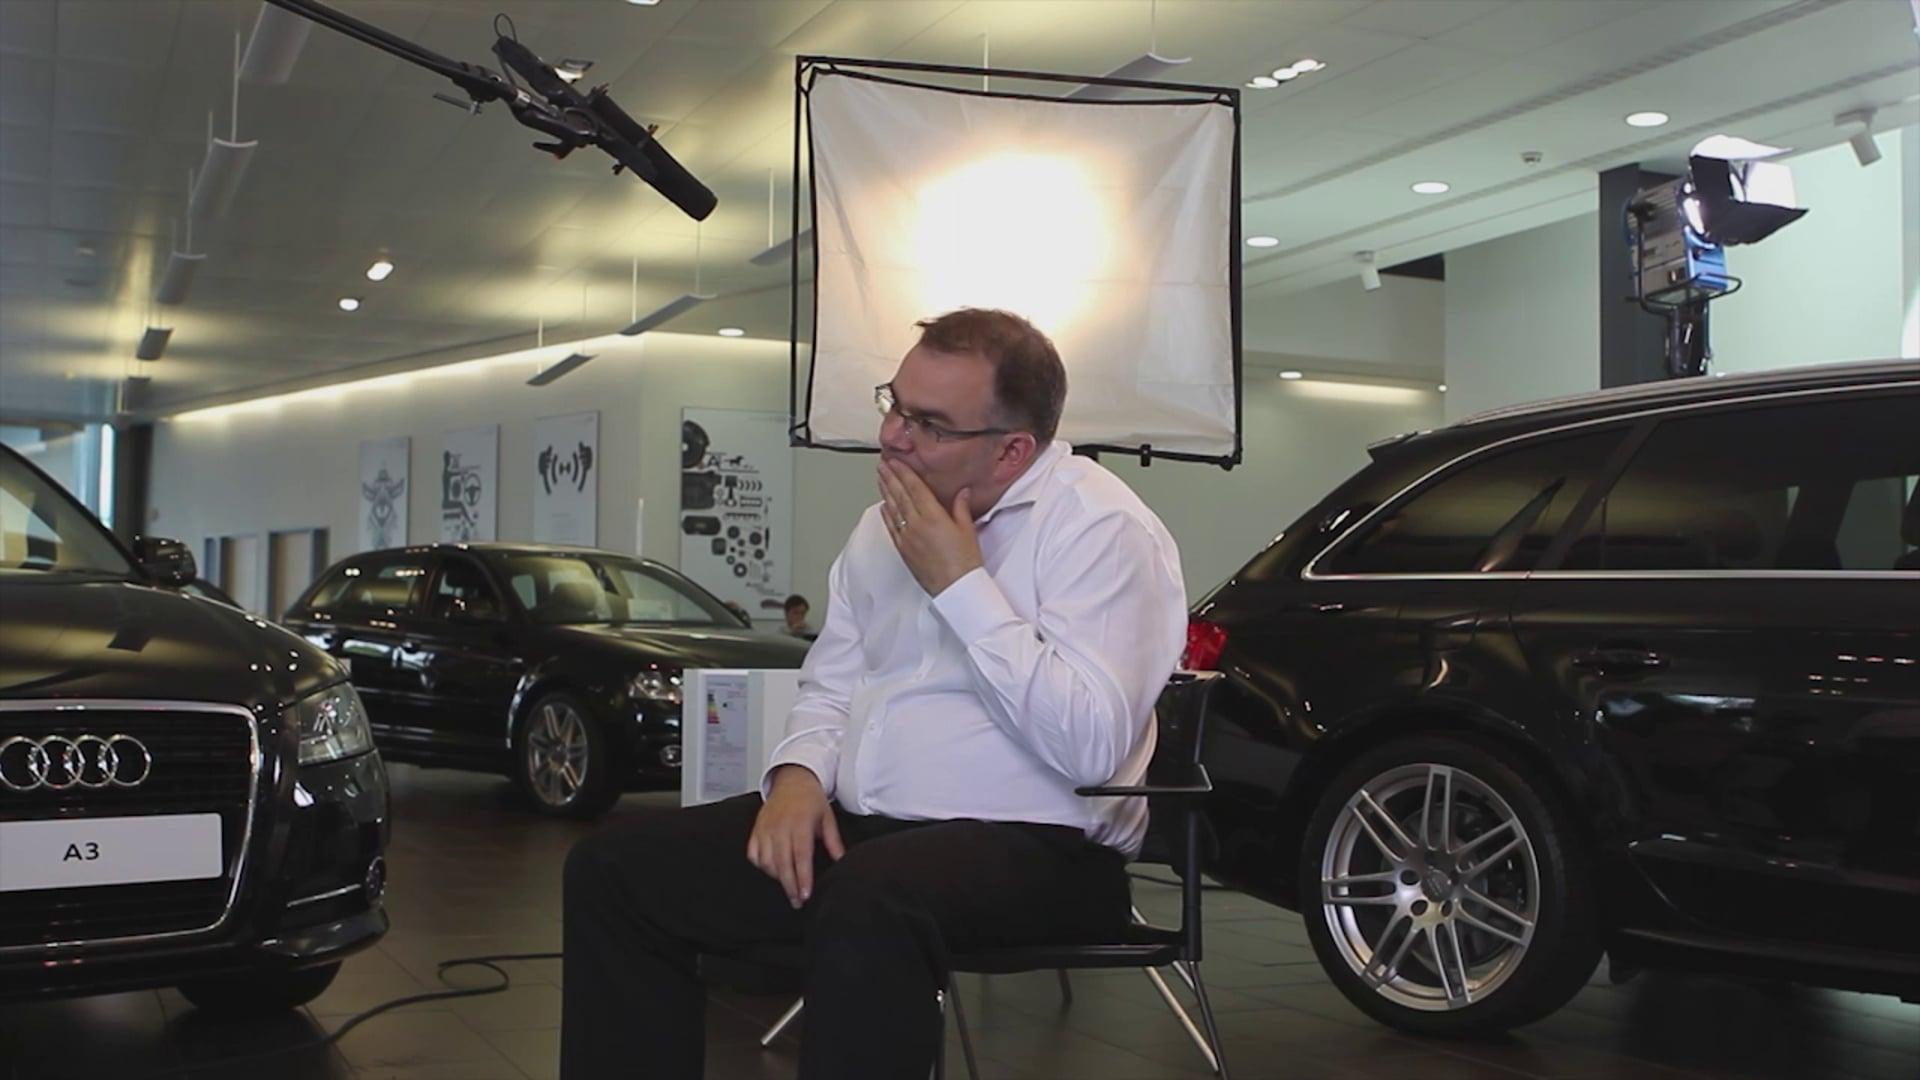 Audi 'Goodwill' Rep Interview